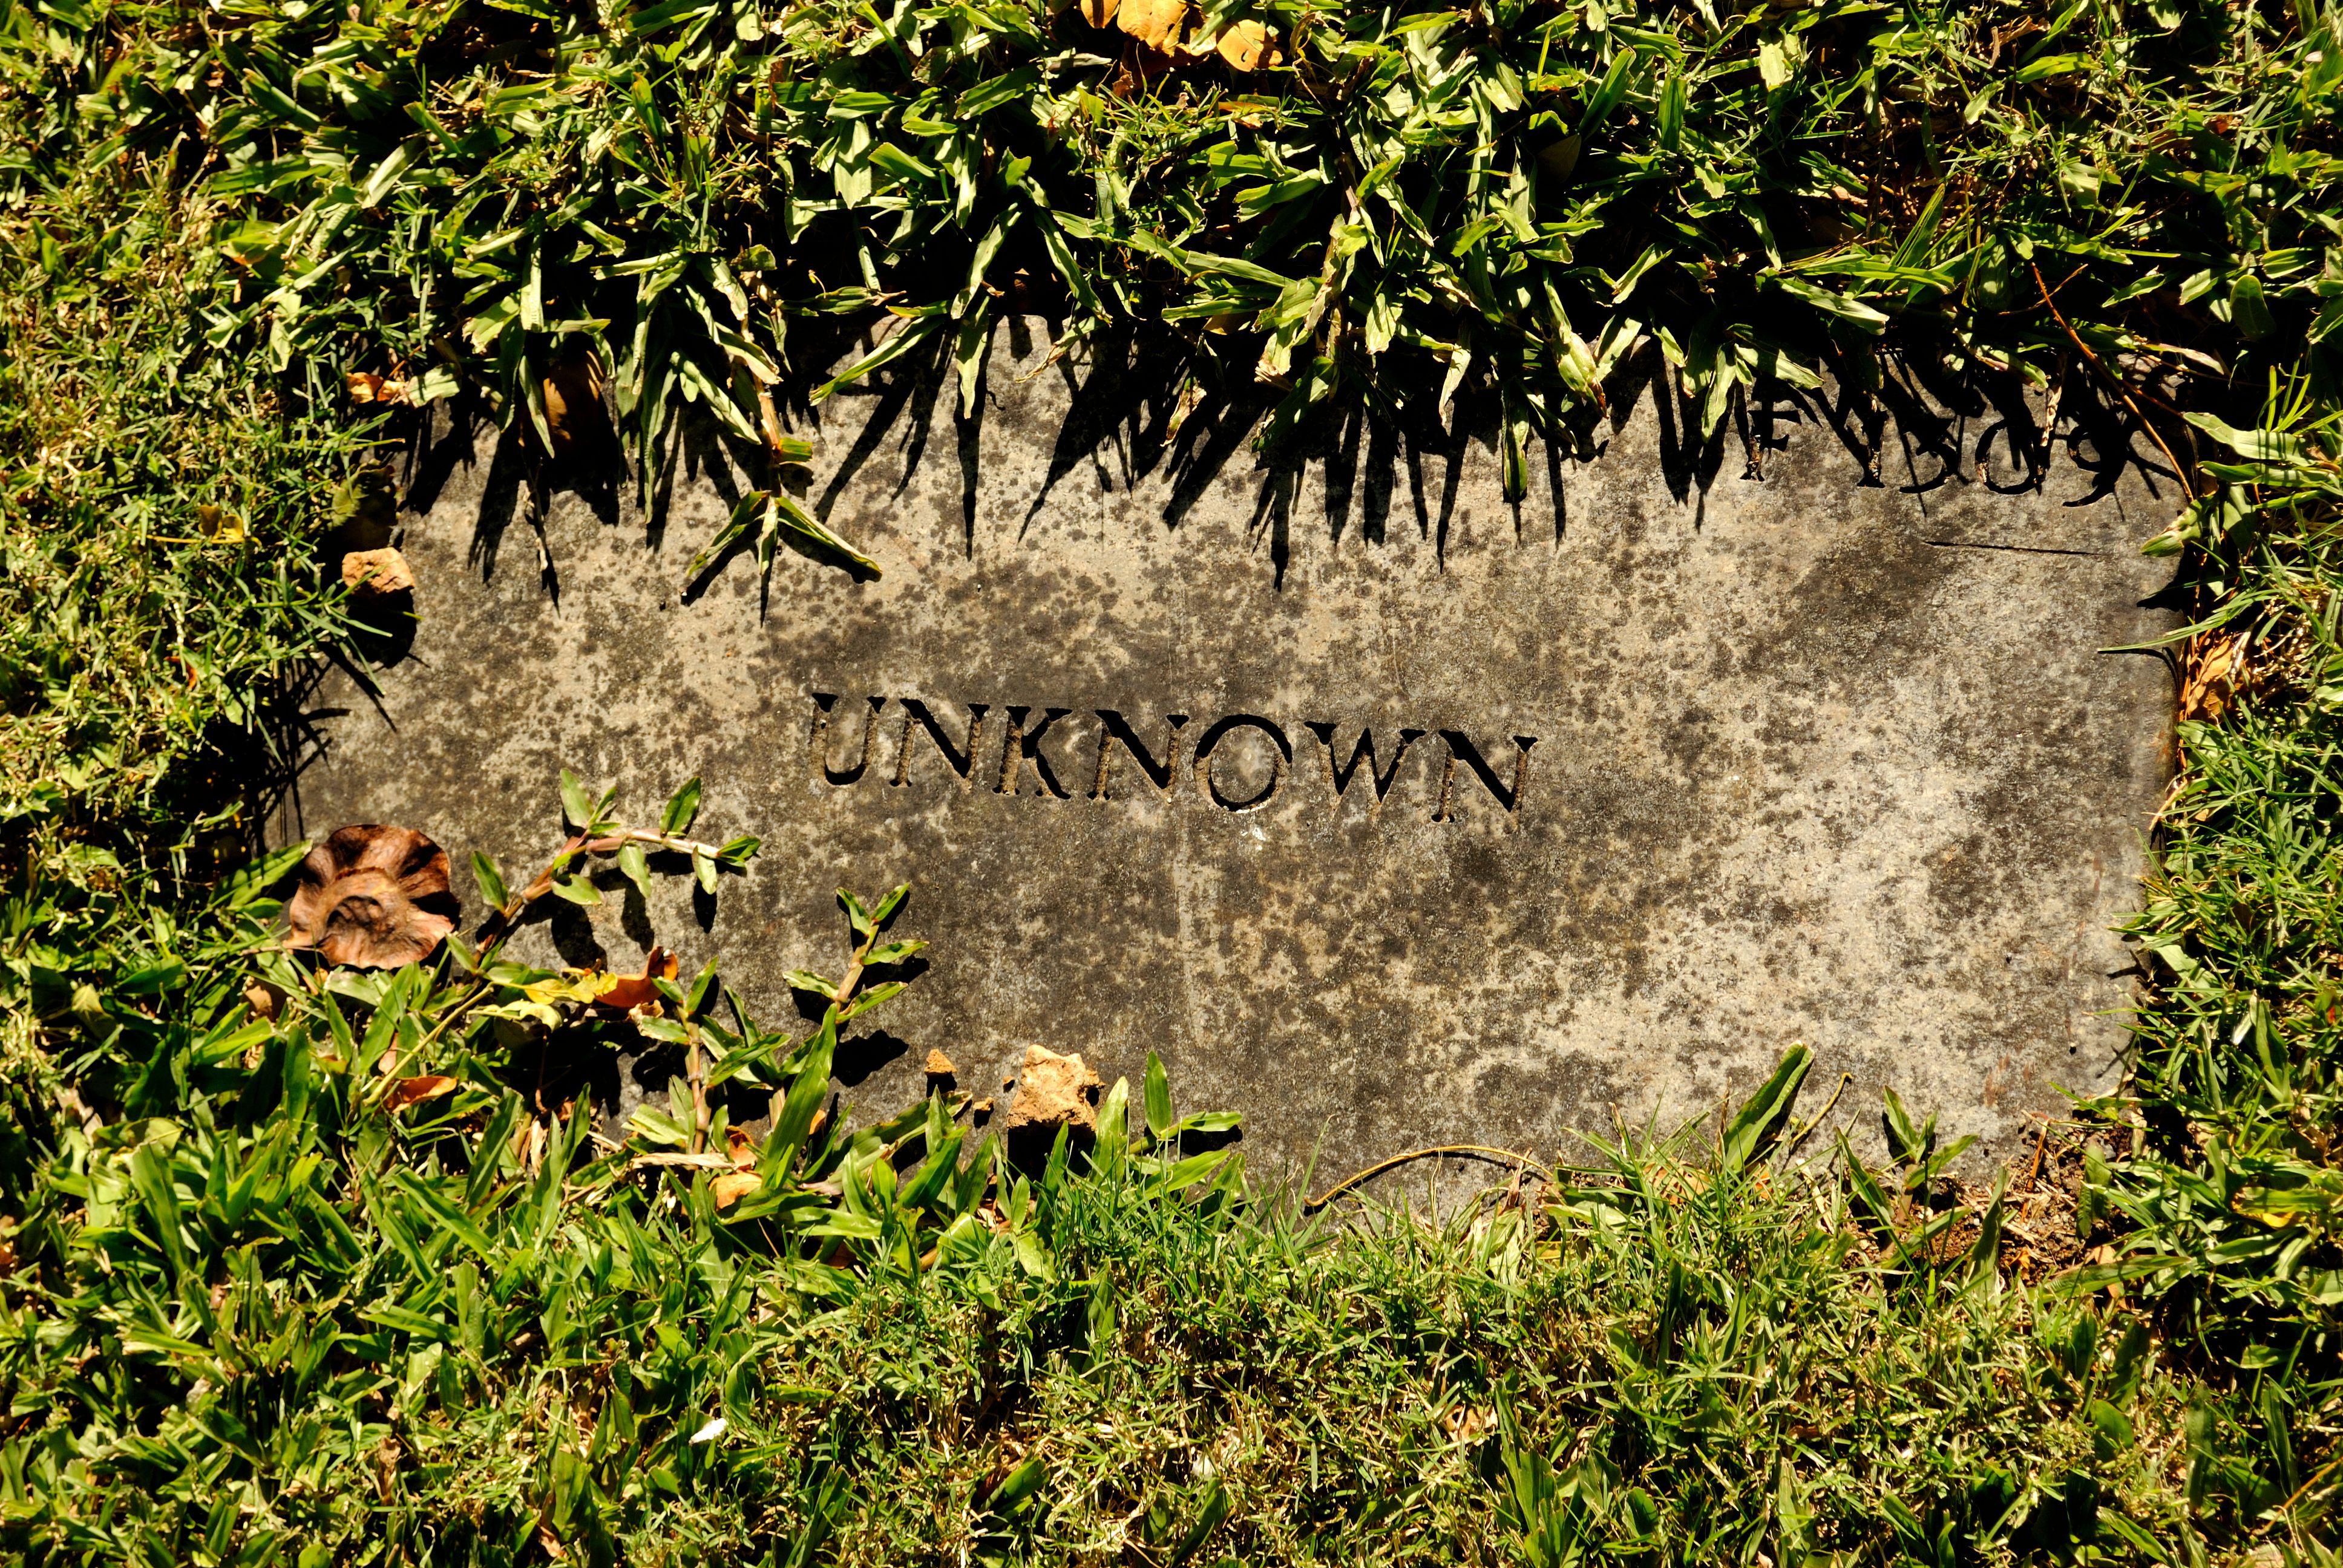 unknown_grave_marker_no_date_5267724283.jpg